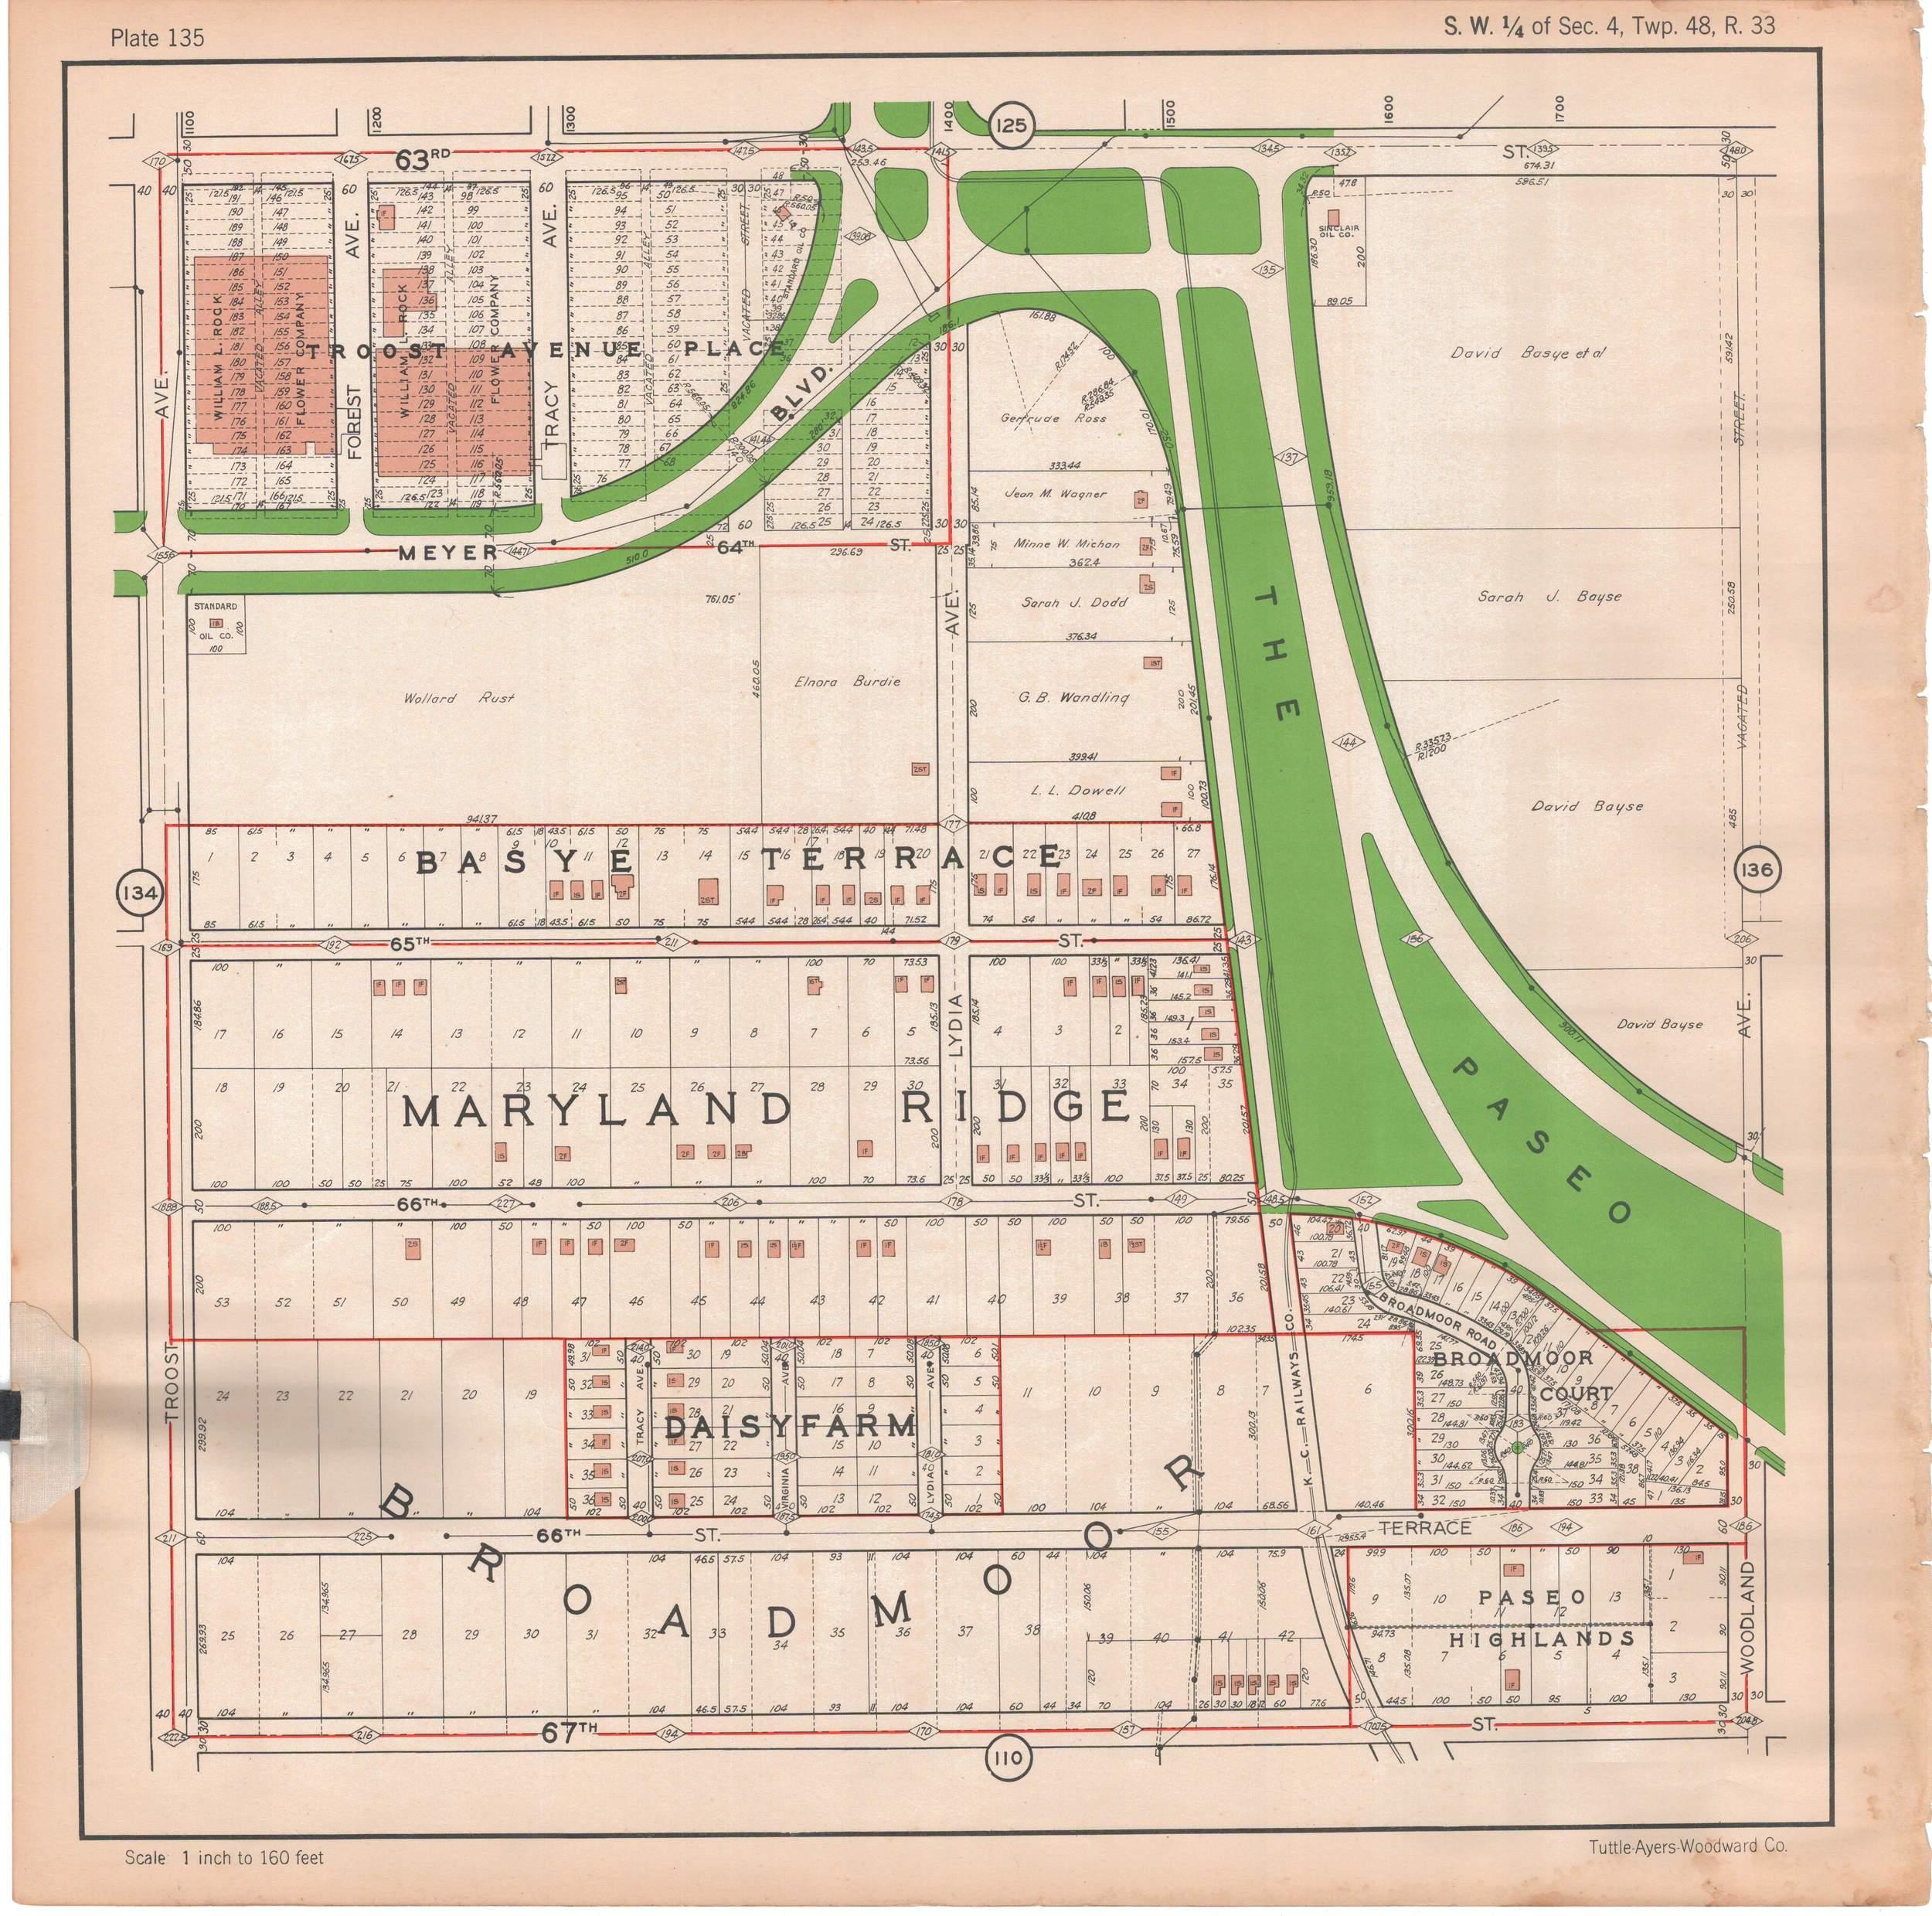 1925 TUTTLE_AYERS_Plate_135.JPG